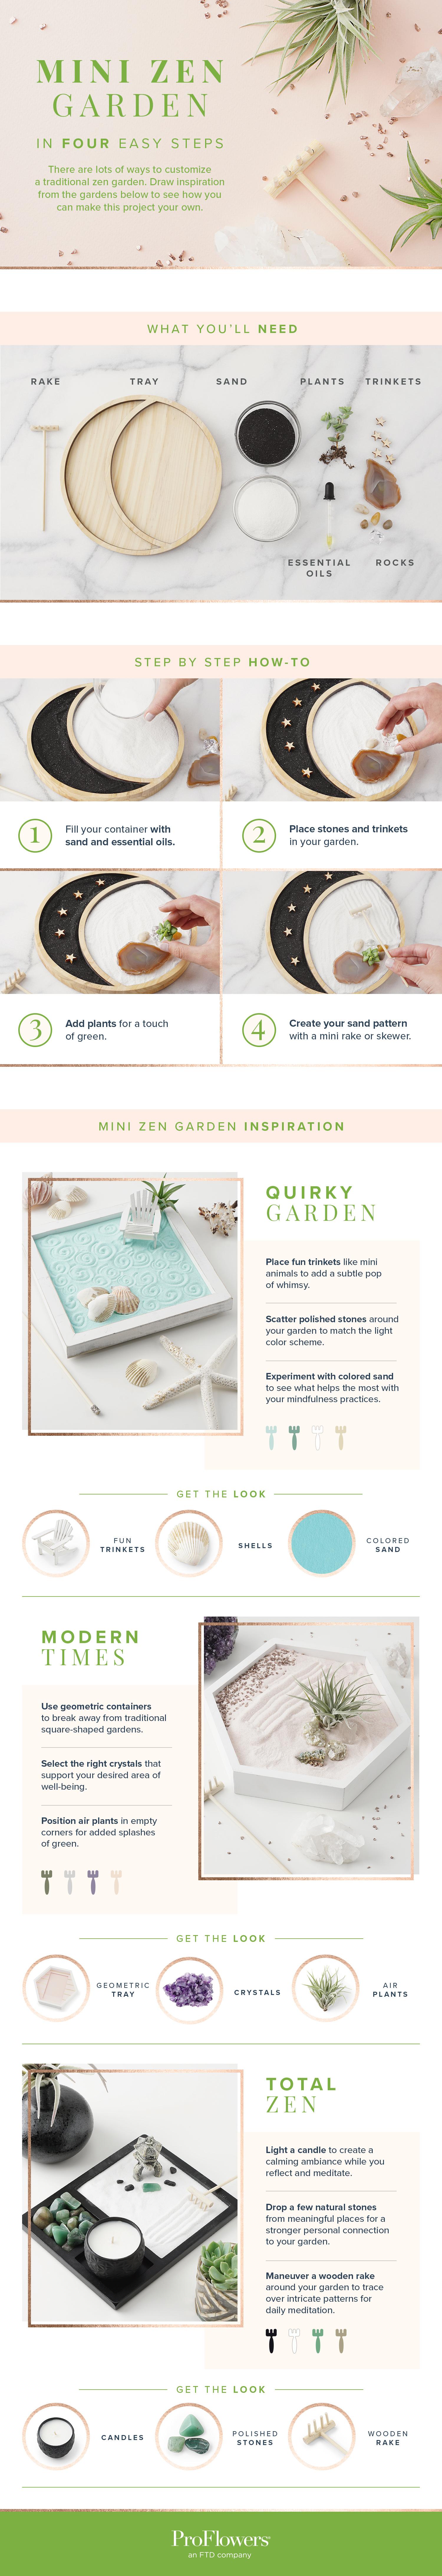 mini zen garden styling tips